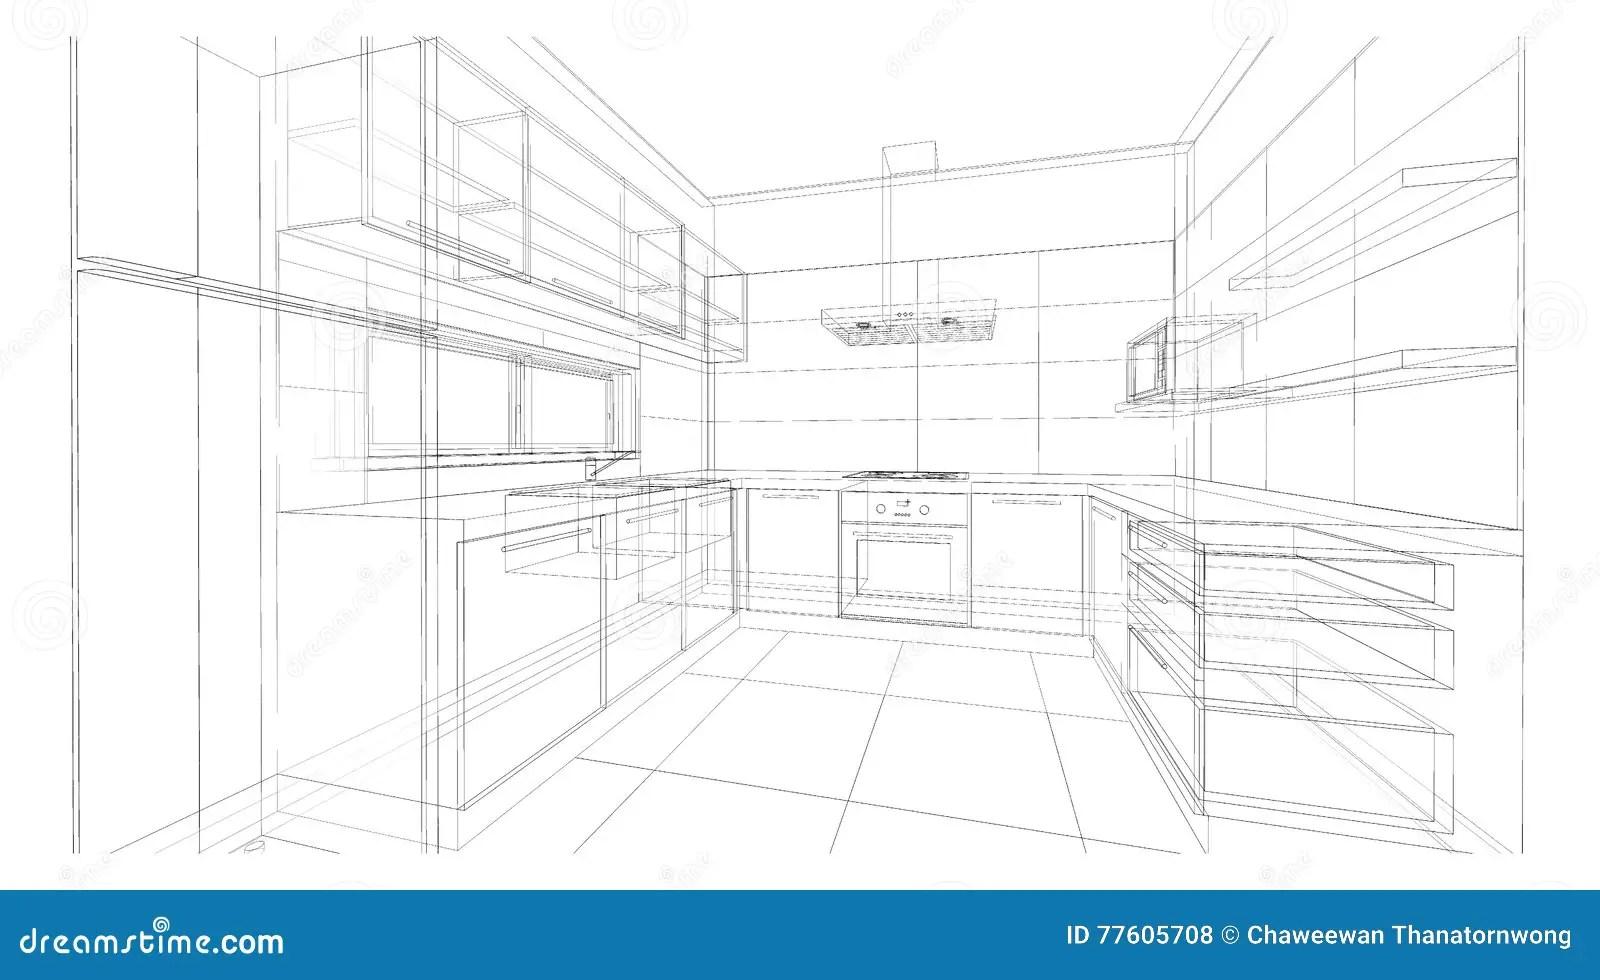 framed prints for kitchens gel kitchen mat 室内设计 厨房库存例证 插画包括有设计 出票人 功能 容易 食物 厨房